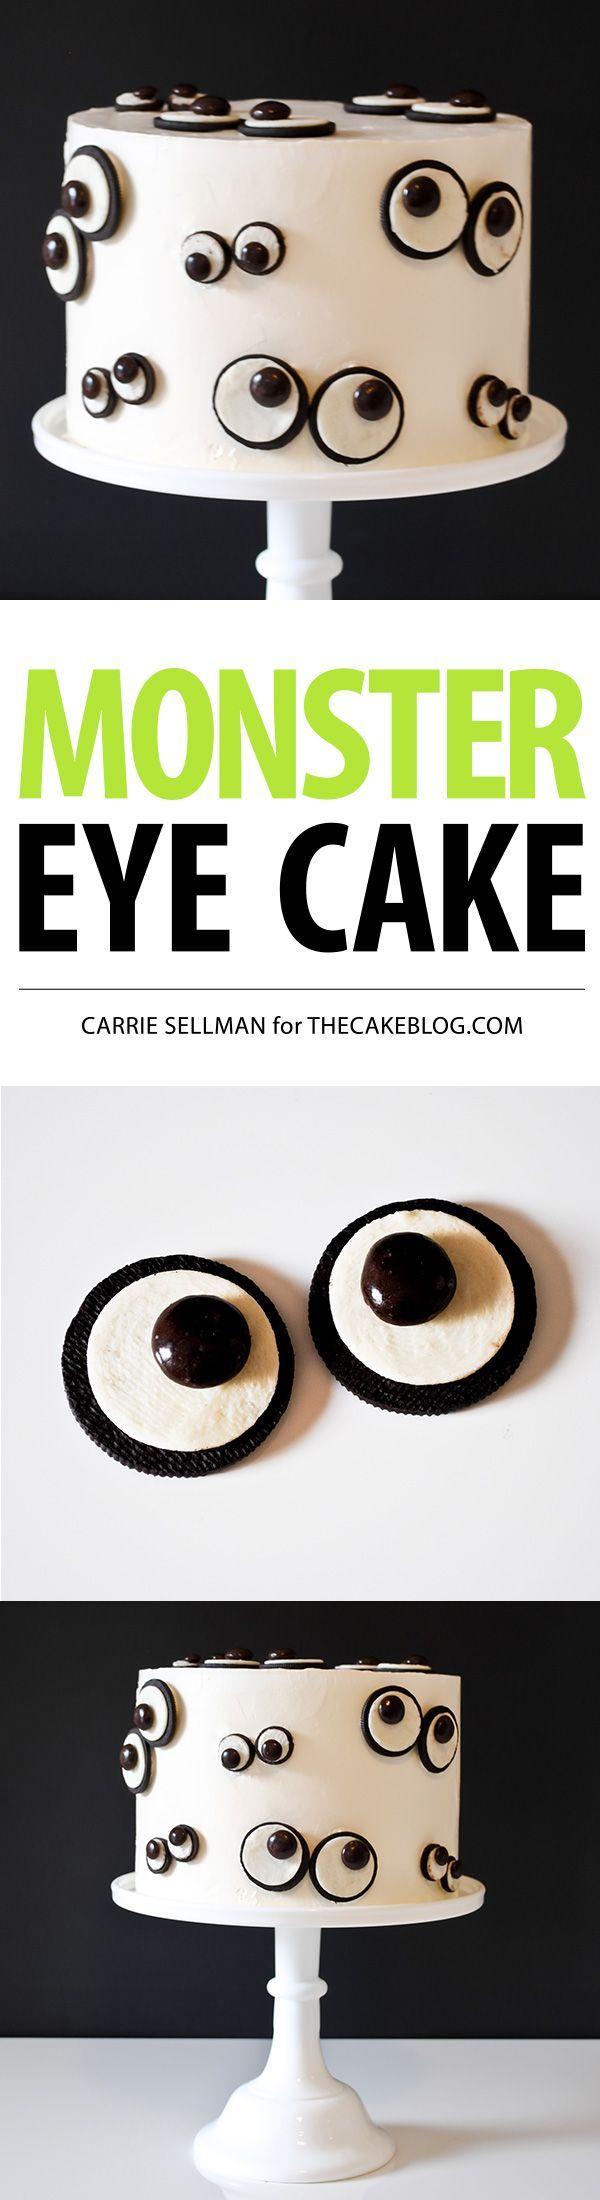 Easy Monster Eye Cake for Halloween   by Carrie Sellman for TheCakeBlog.com